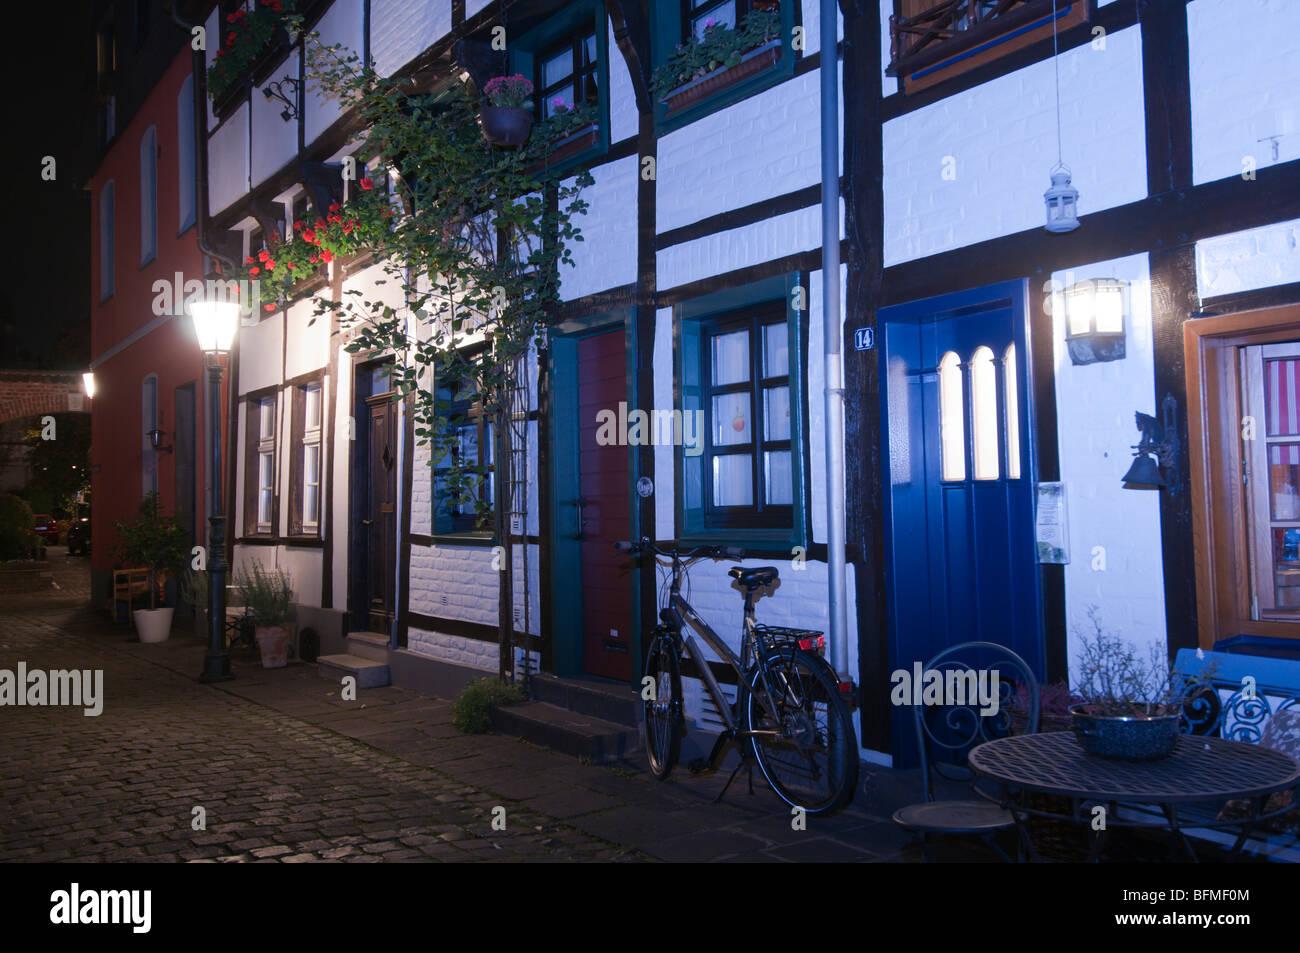 En Allemagne, la Rhénanie du Nord-Westphalie, Kempen, Alteschulstrasse,street, maisons anciennes Banque D'Images